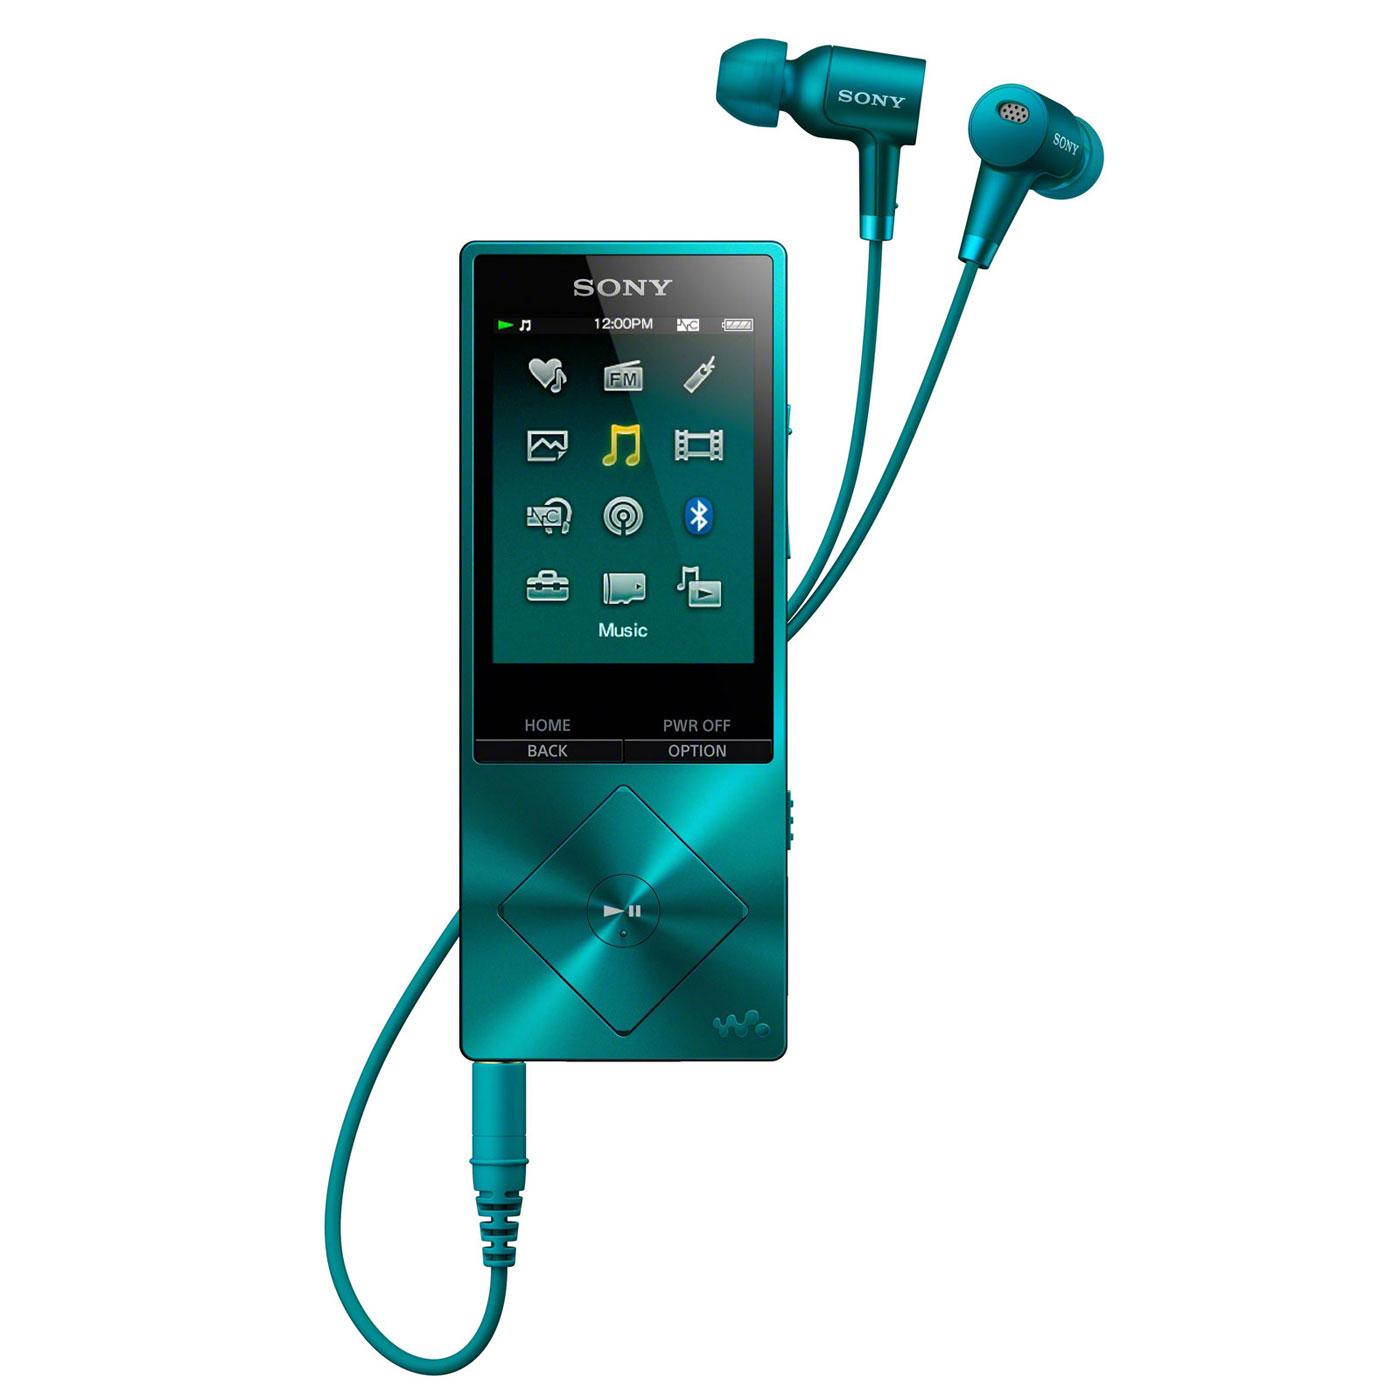 sony nw a25hn bleu lecteur mp3 ipod sony sur ldlc. Black Bedroom Furniture Sets. Home Design Ideas